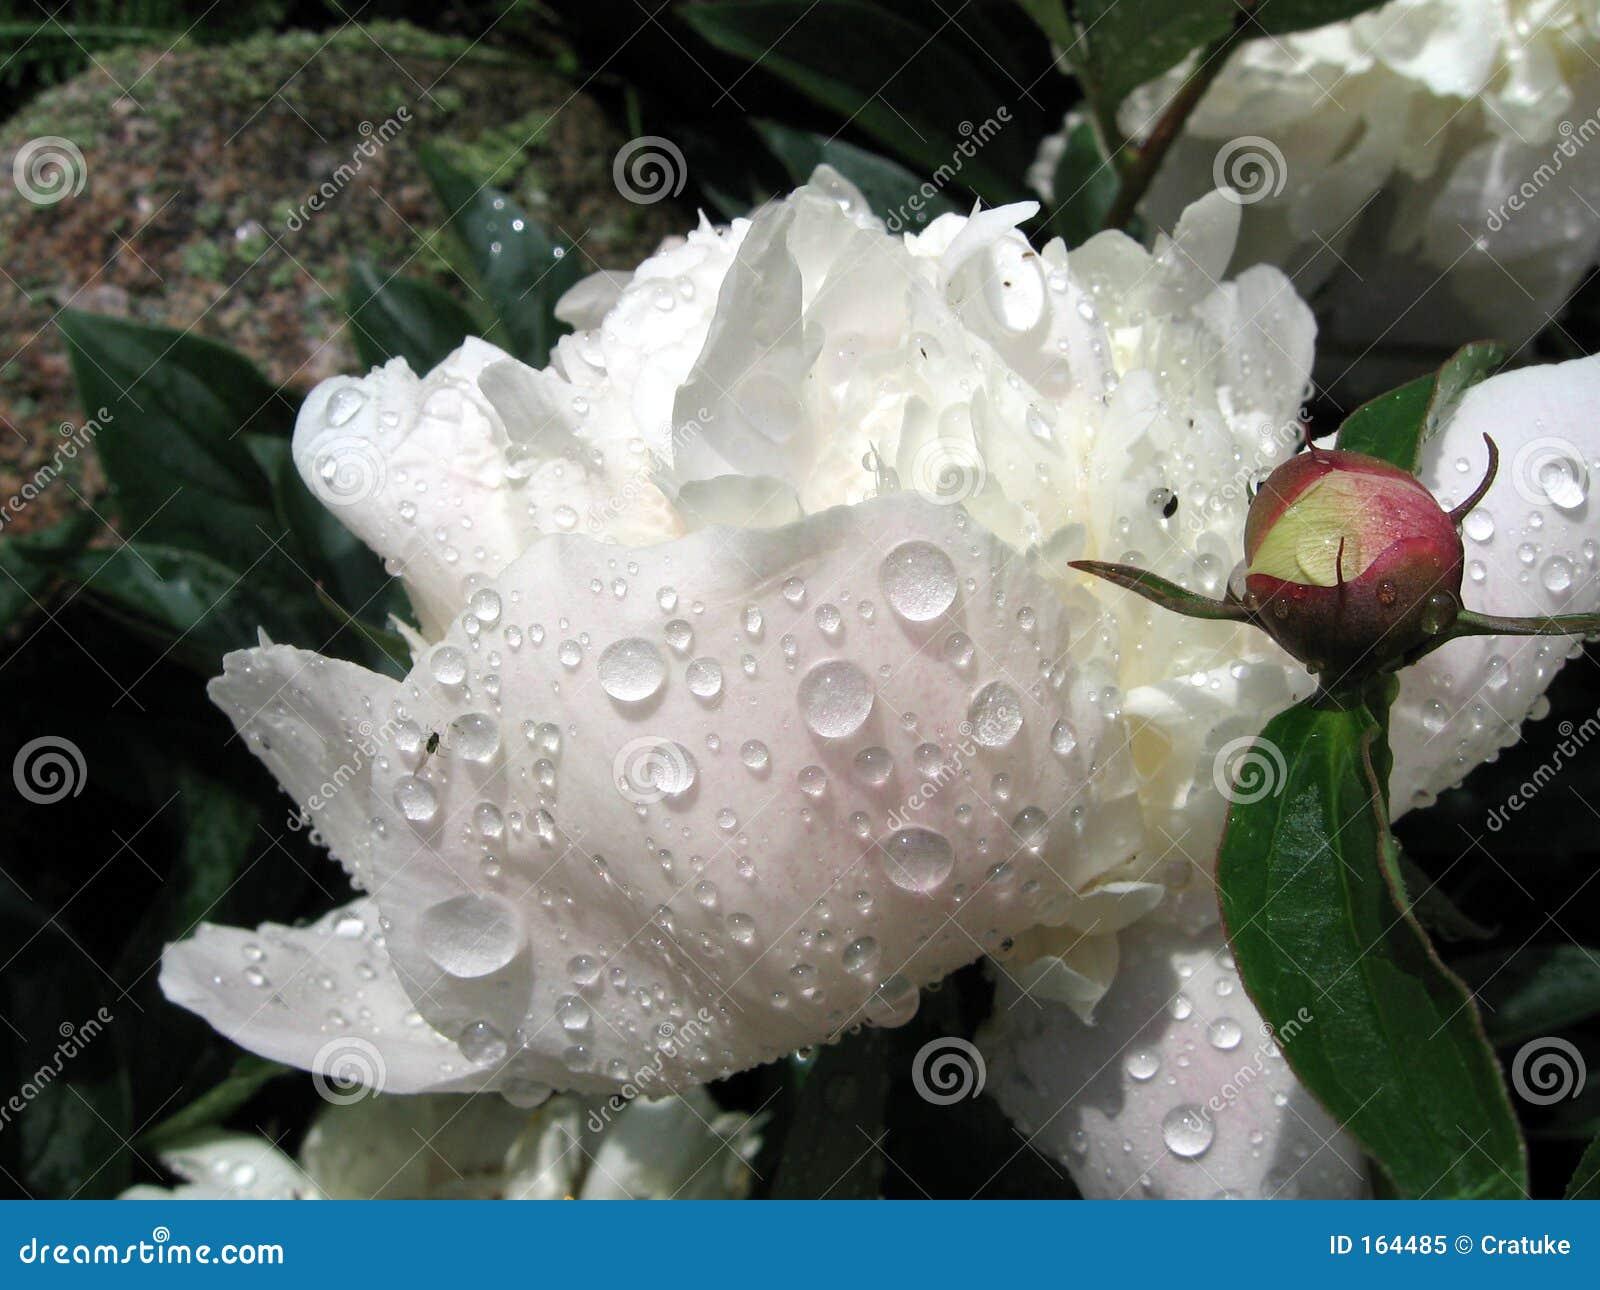 Raindrops on the white peony